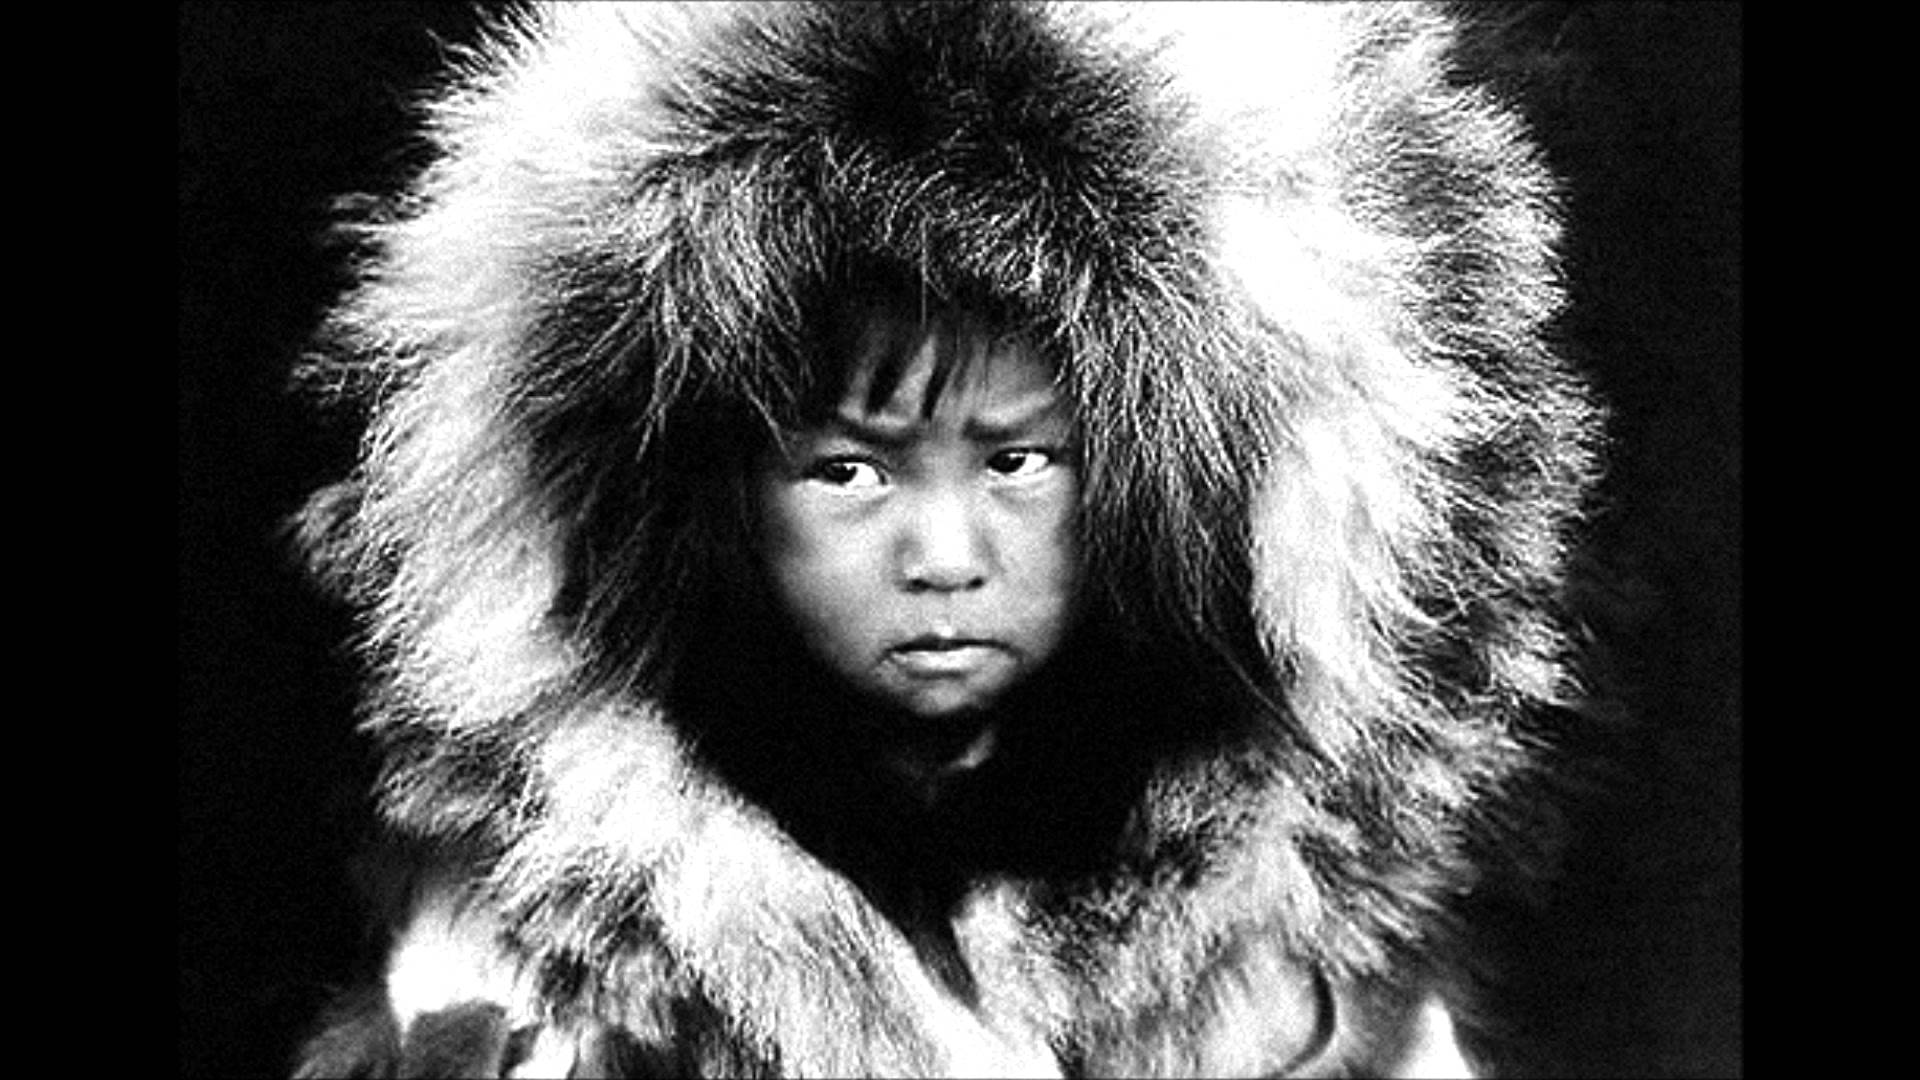 HQ Eskimo Wallpapers | File 214.27Kb